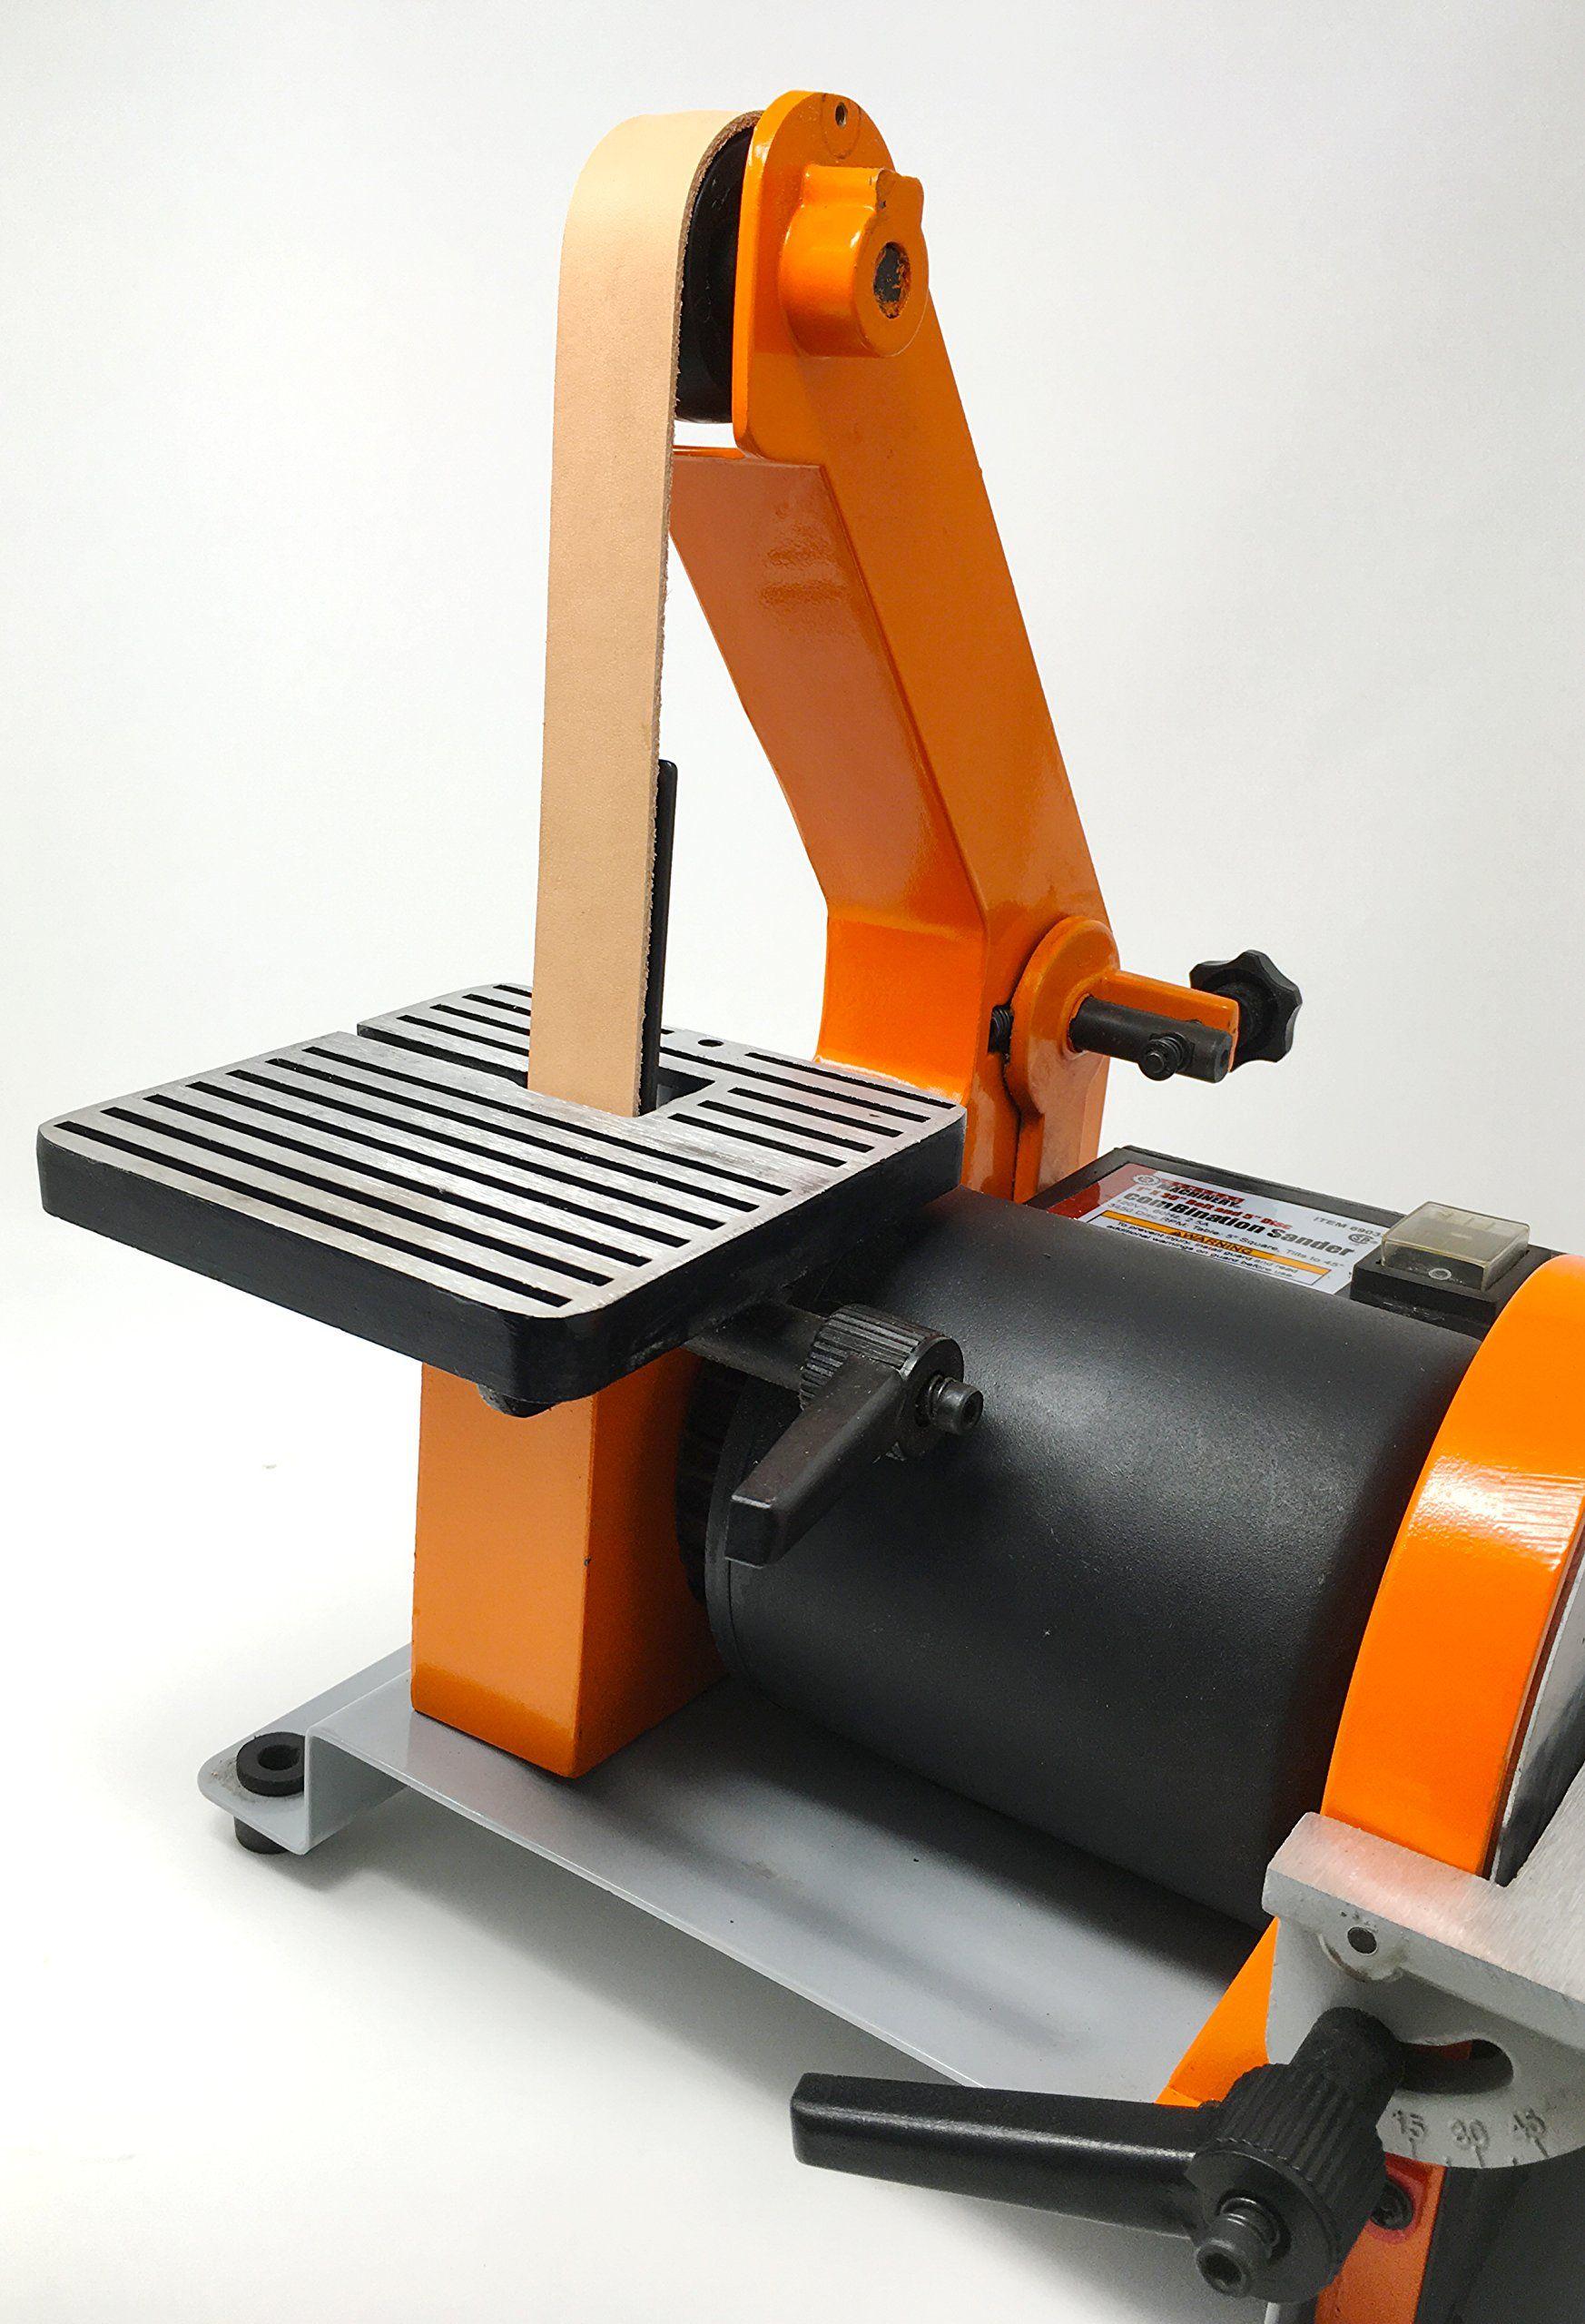 MK Morse CTD21 Carbide Tipped Deep Hole Cutter 33mm 1-5//16-Inch